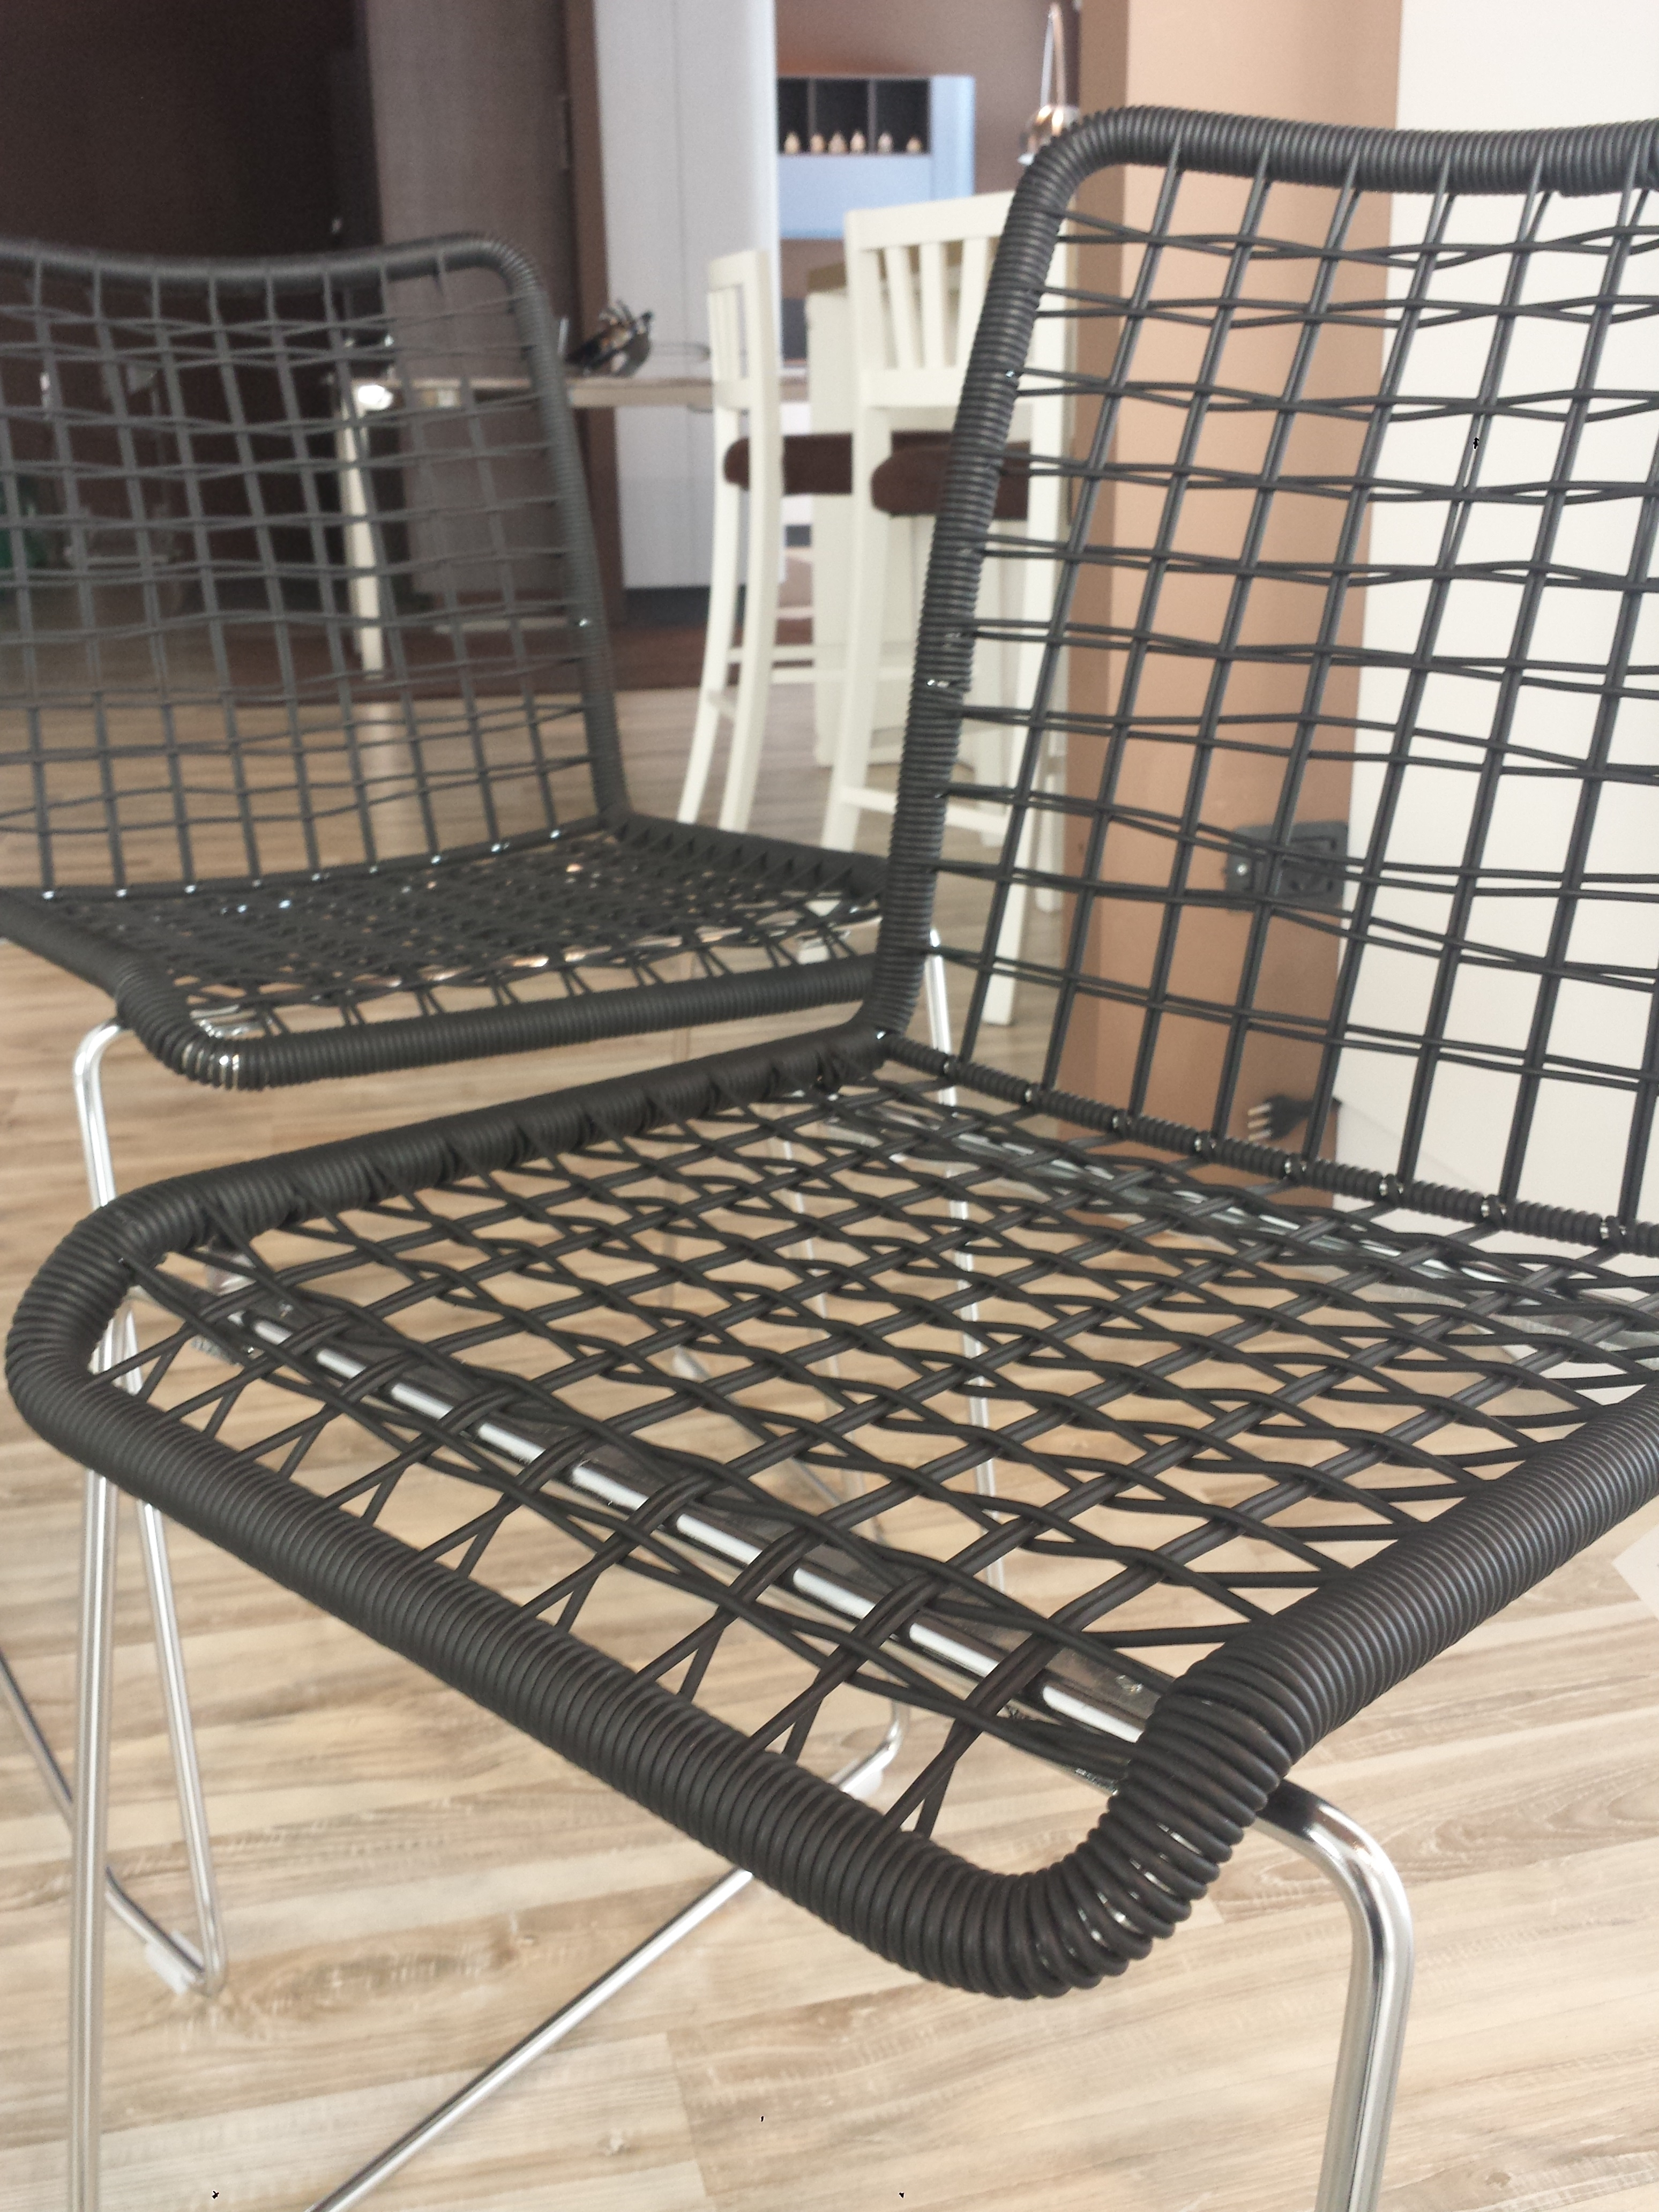 4 sedie moderne light 18690 sedie a prezzi scontati for Sedie moderne prezzi